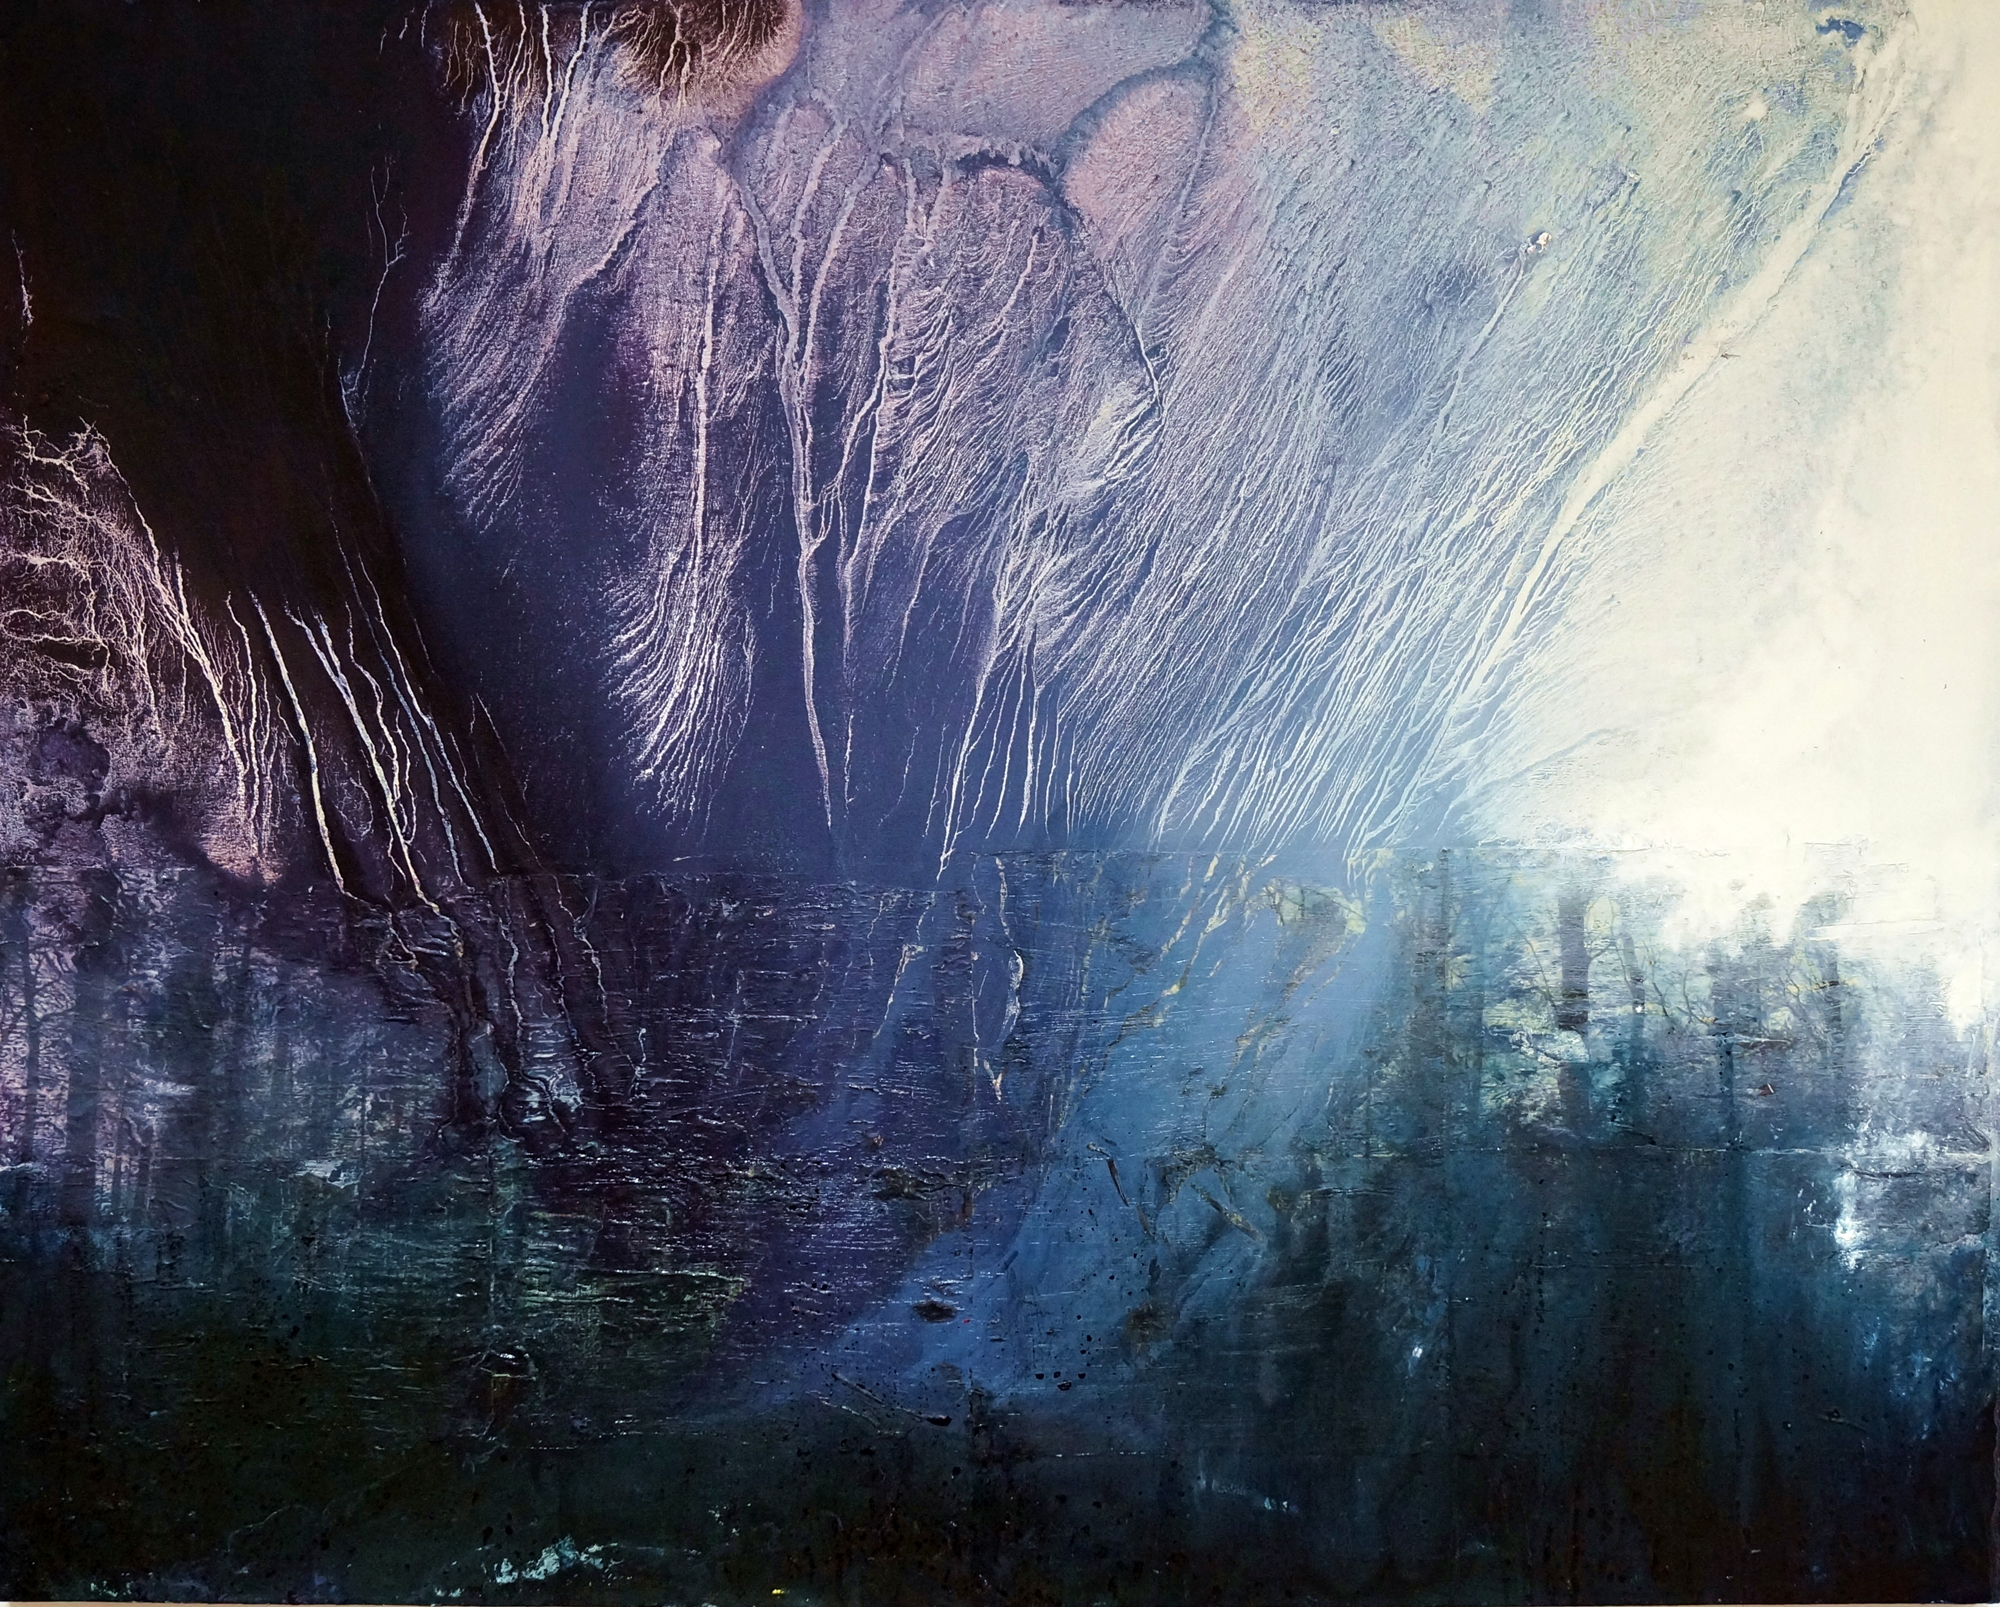 'Fragmentation 2' (2013) by Christine Levis, Oil paint & photo transfer on canvas (153 x 122 cm)